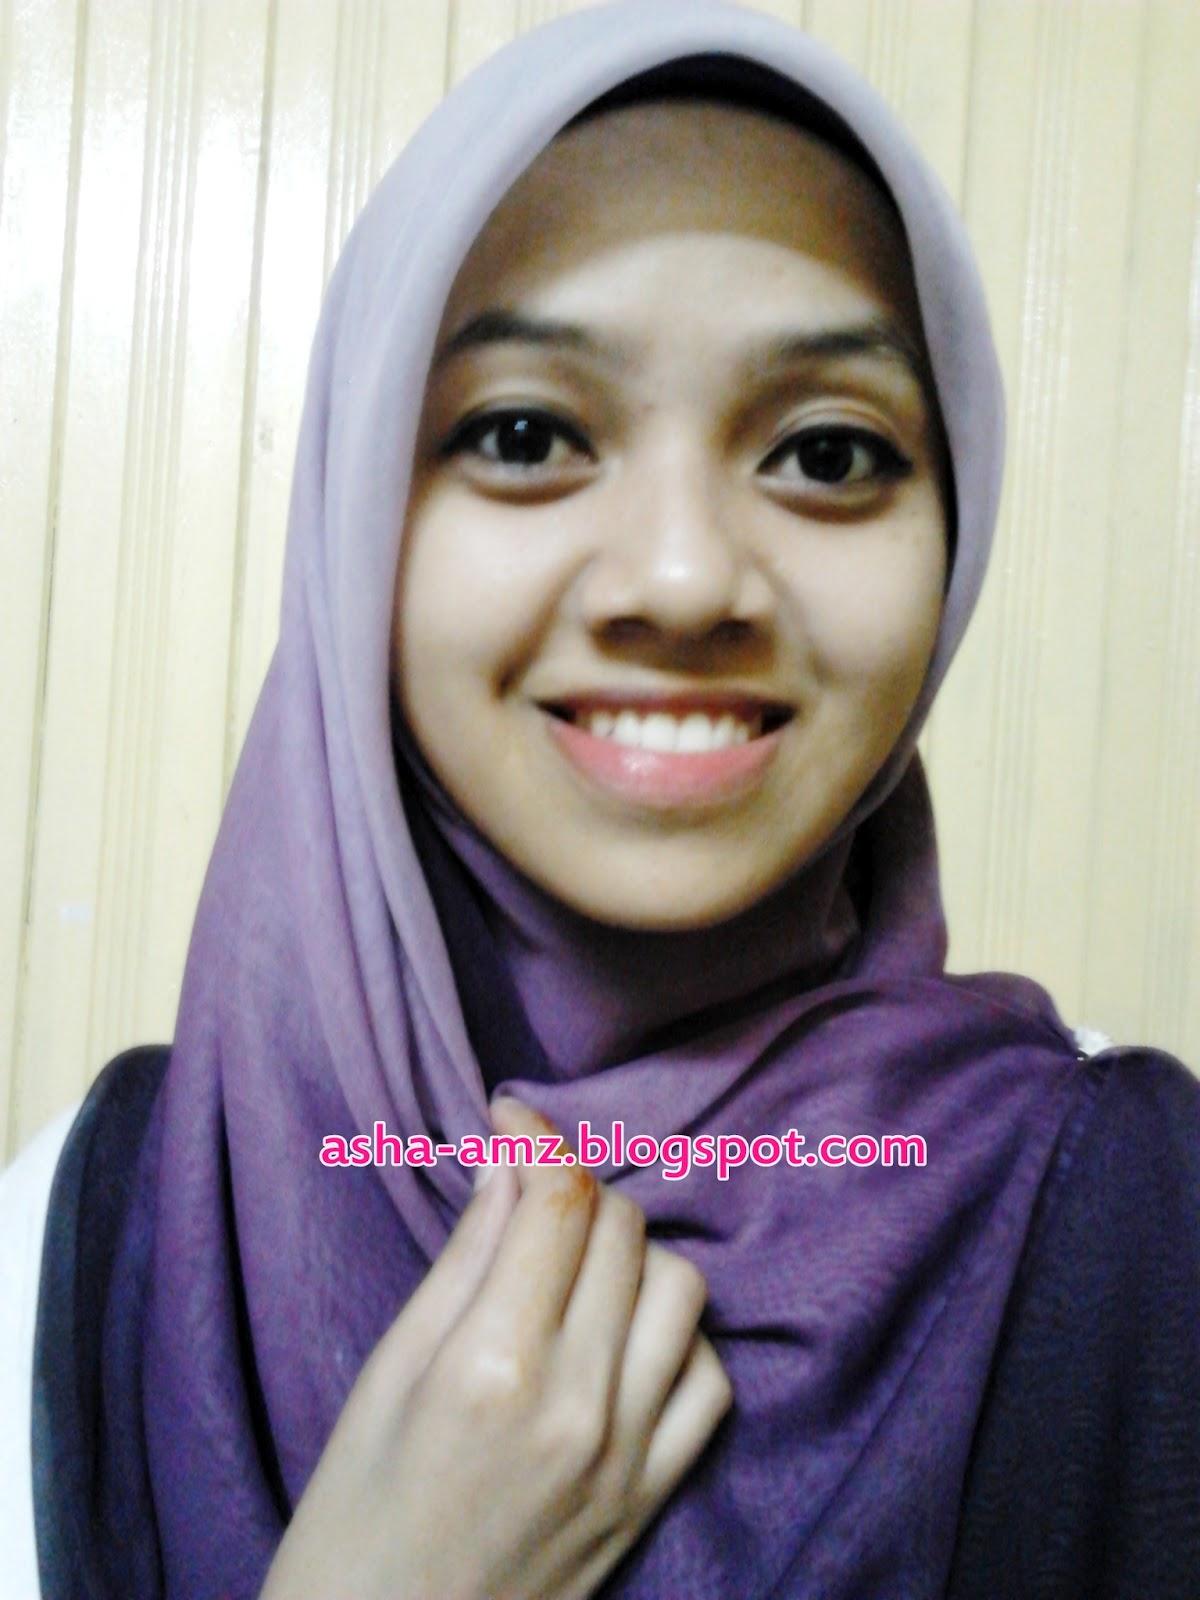 Cara Pakai Tudung Najwa Latif | hairstylegalleries.com